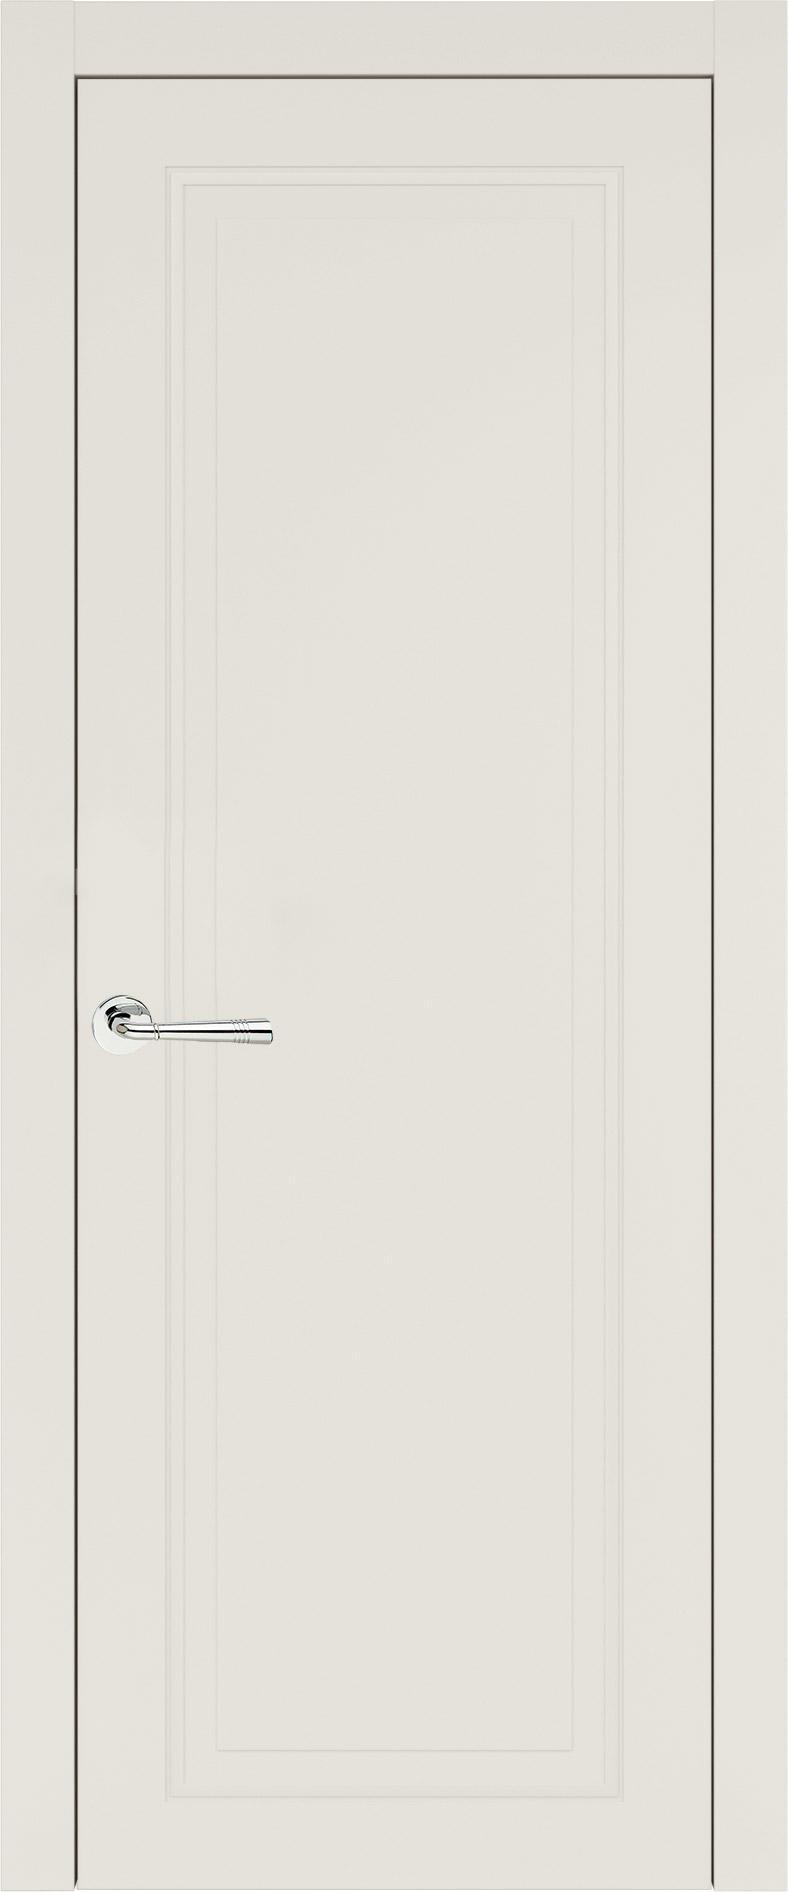 Domenica Neo Classic цвет - Бежевая эмаль (RAL 9010) Без стекла (ДГ)